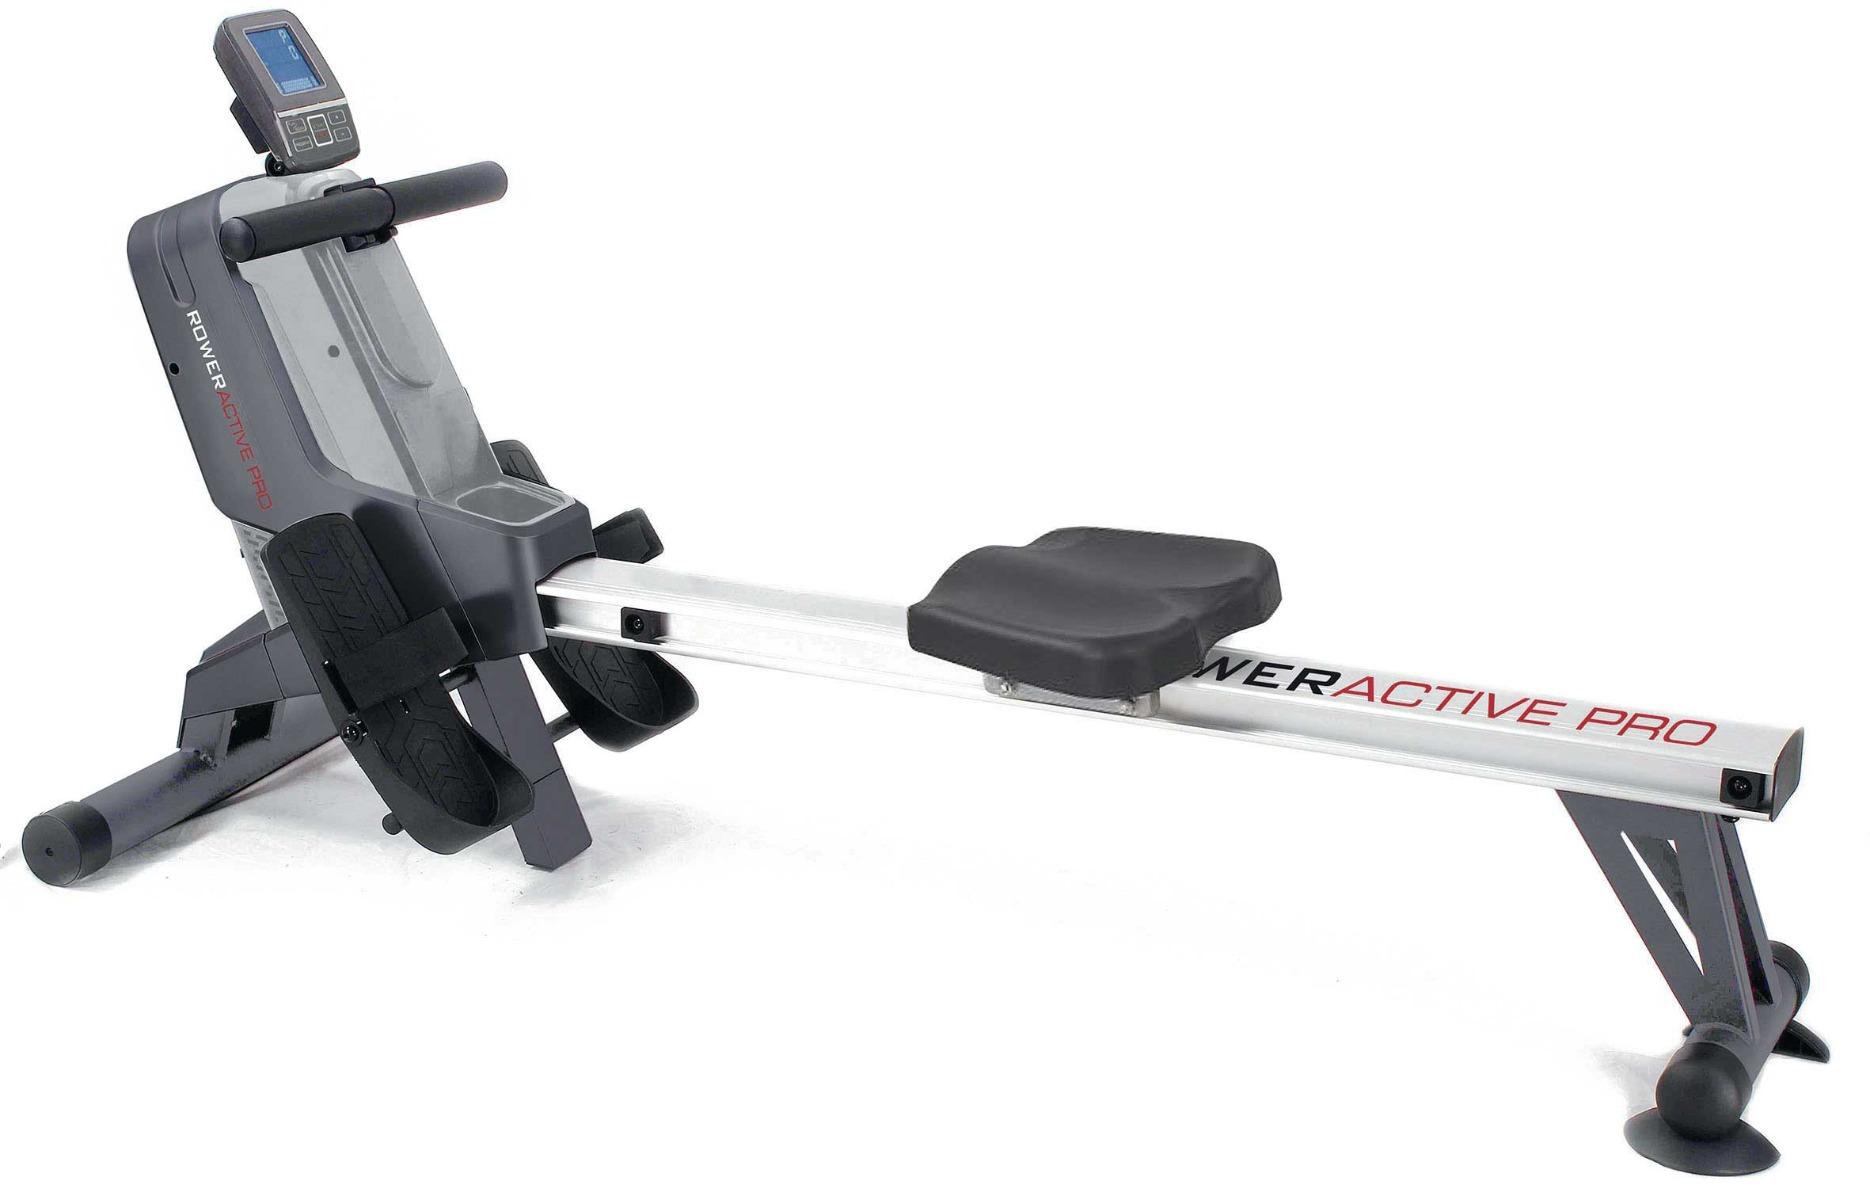 011_rower-active-pro.jpg